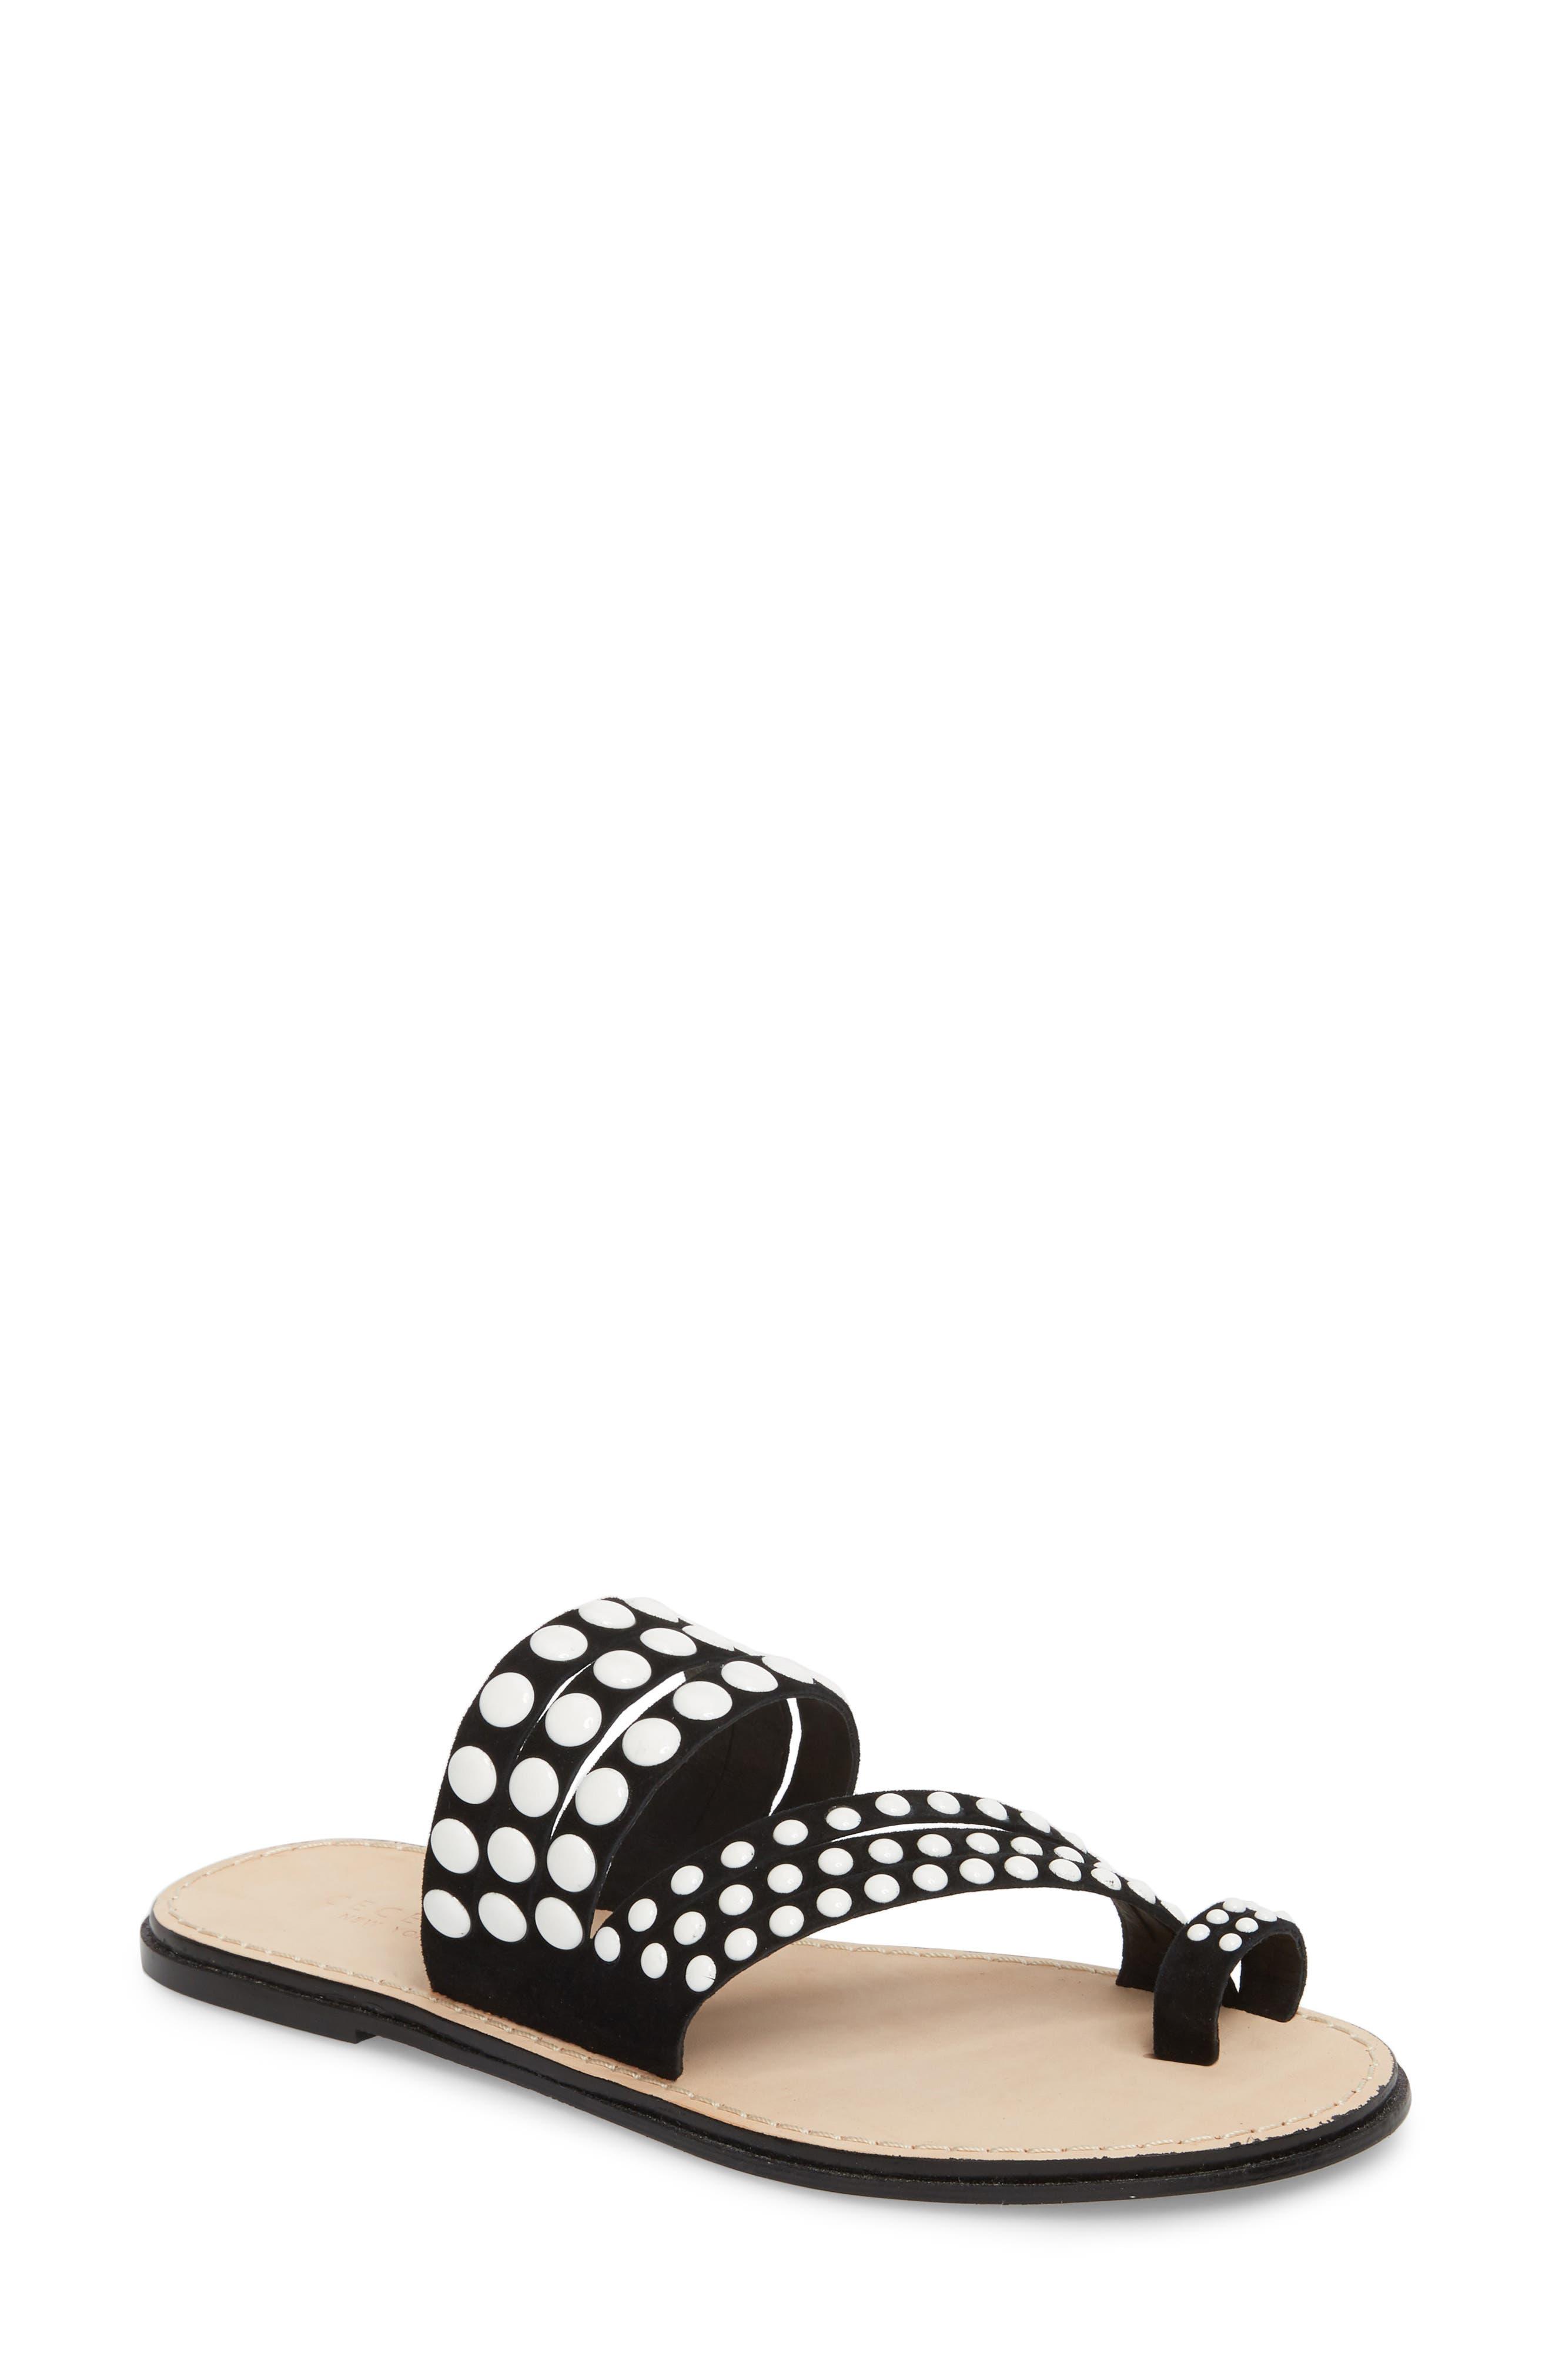 Pezz Studded Sandal,                         Main,                         color, 001